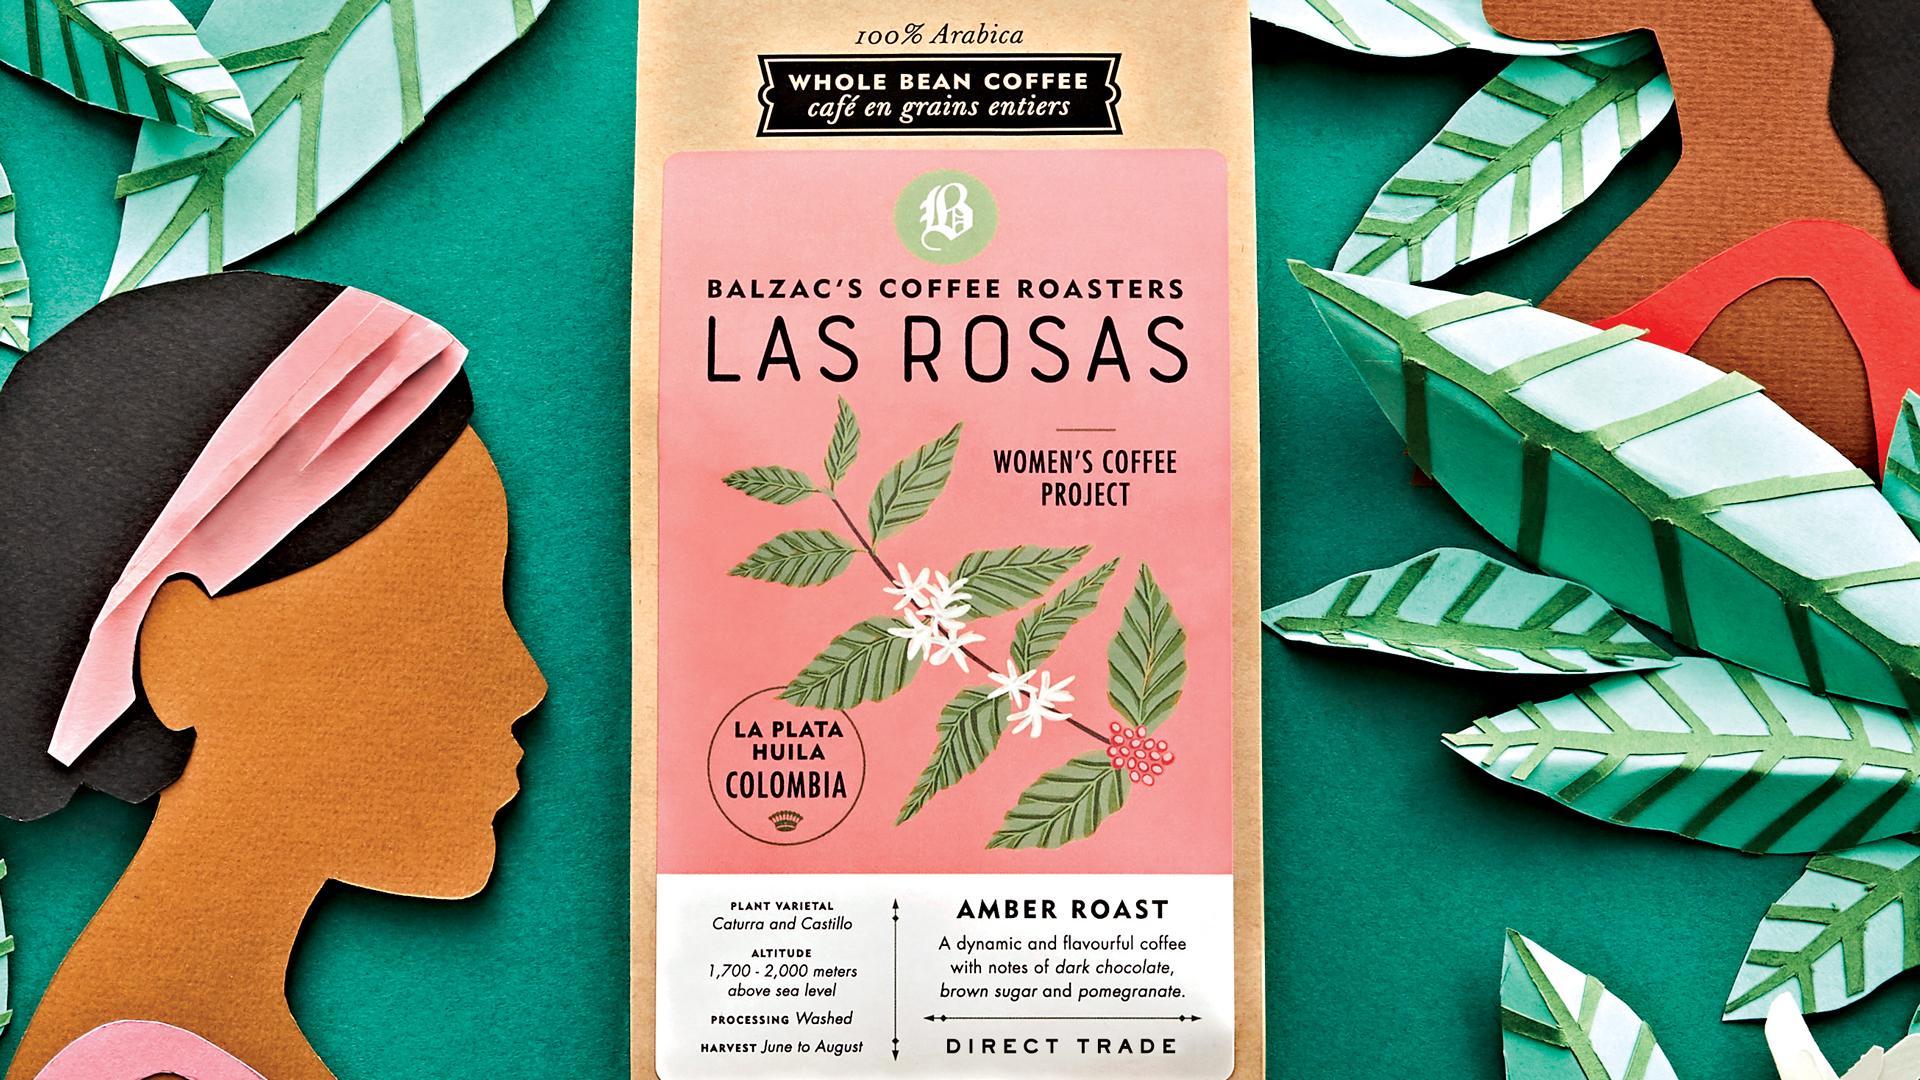 Balzac's Las Rosas Amber Roast